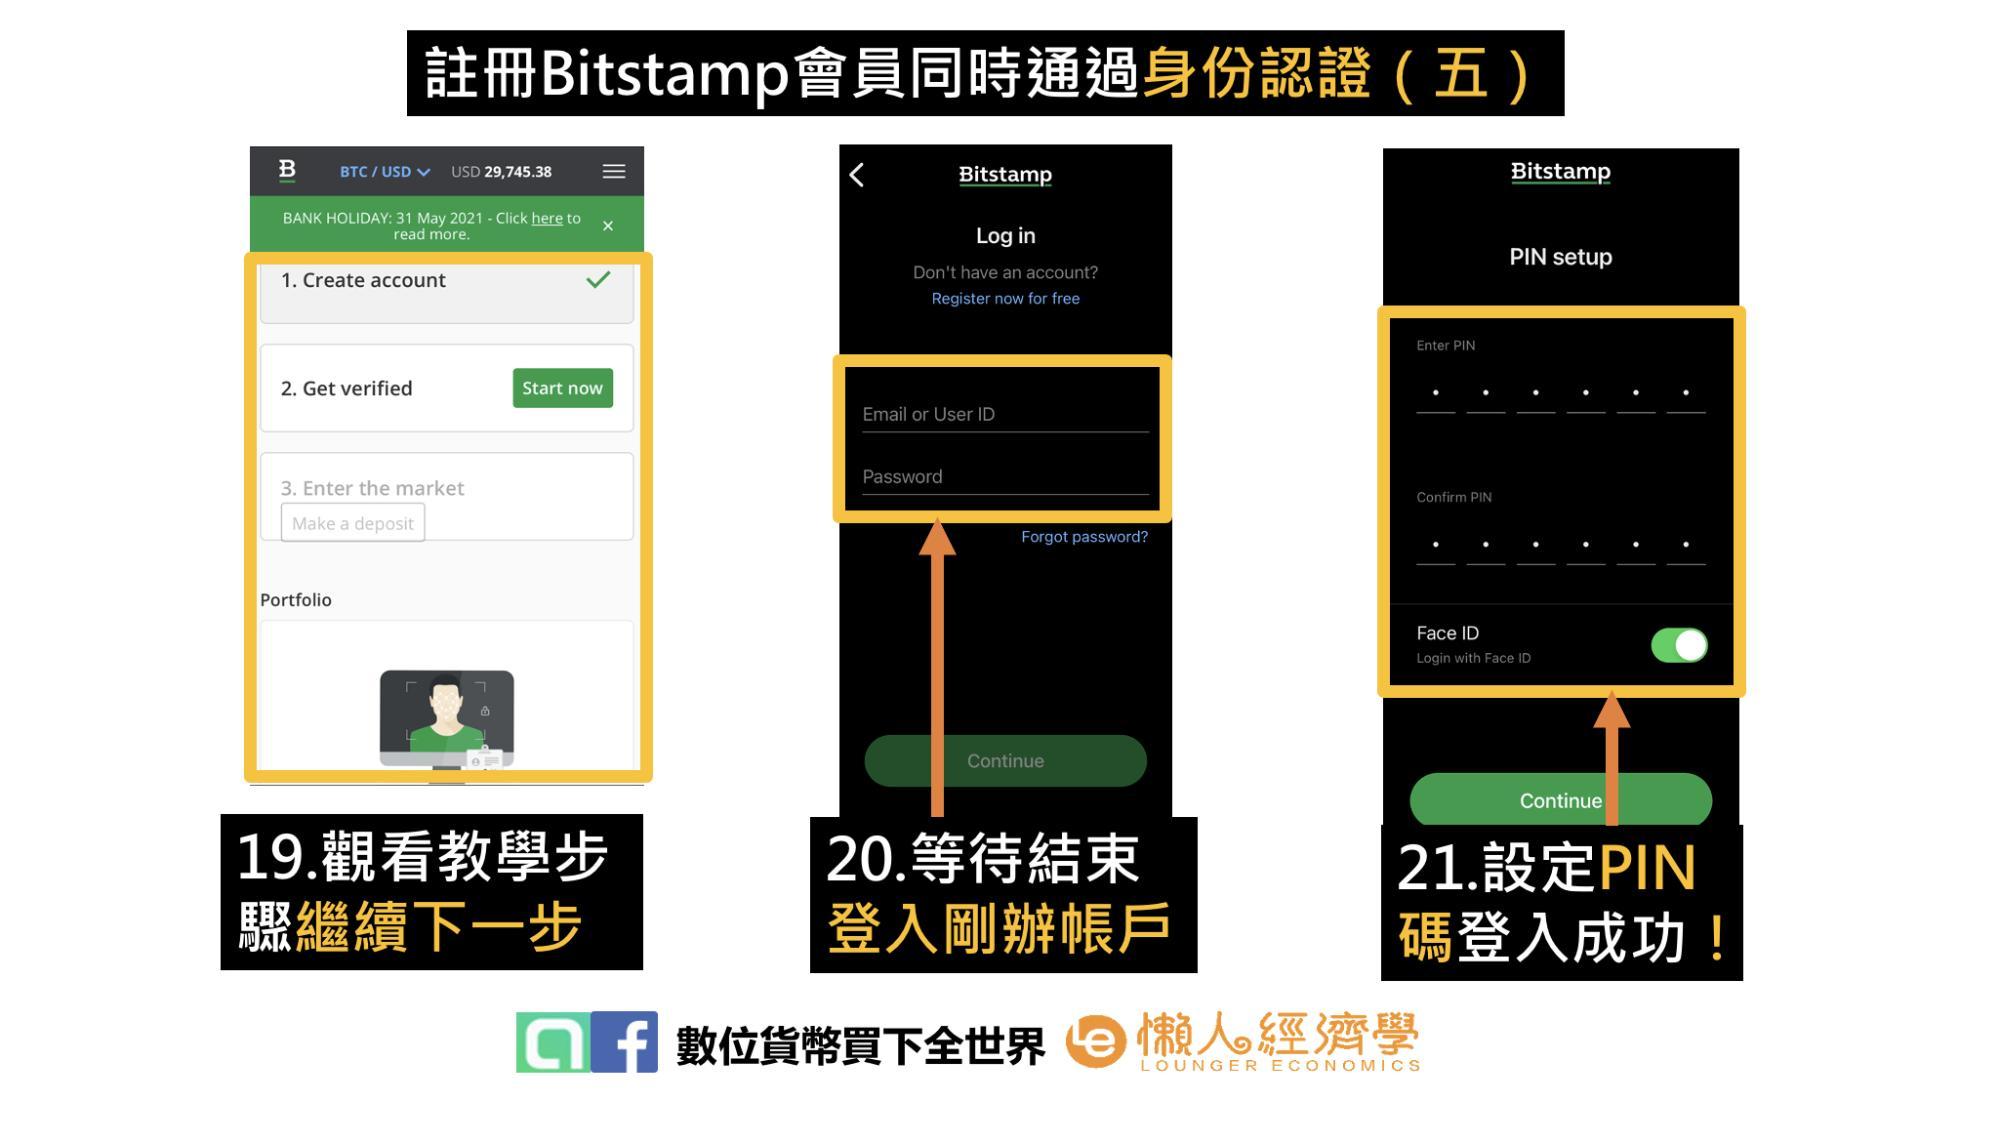 Bitstamp交易所註冊同時進行身份認證流程(五)